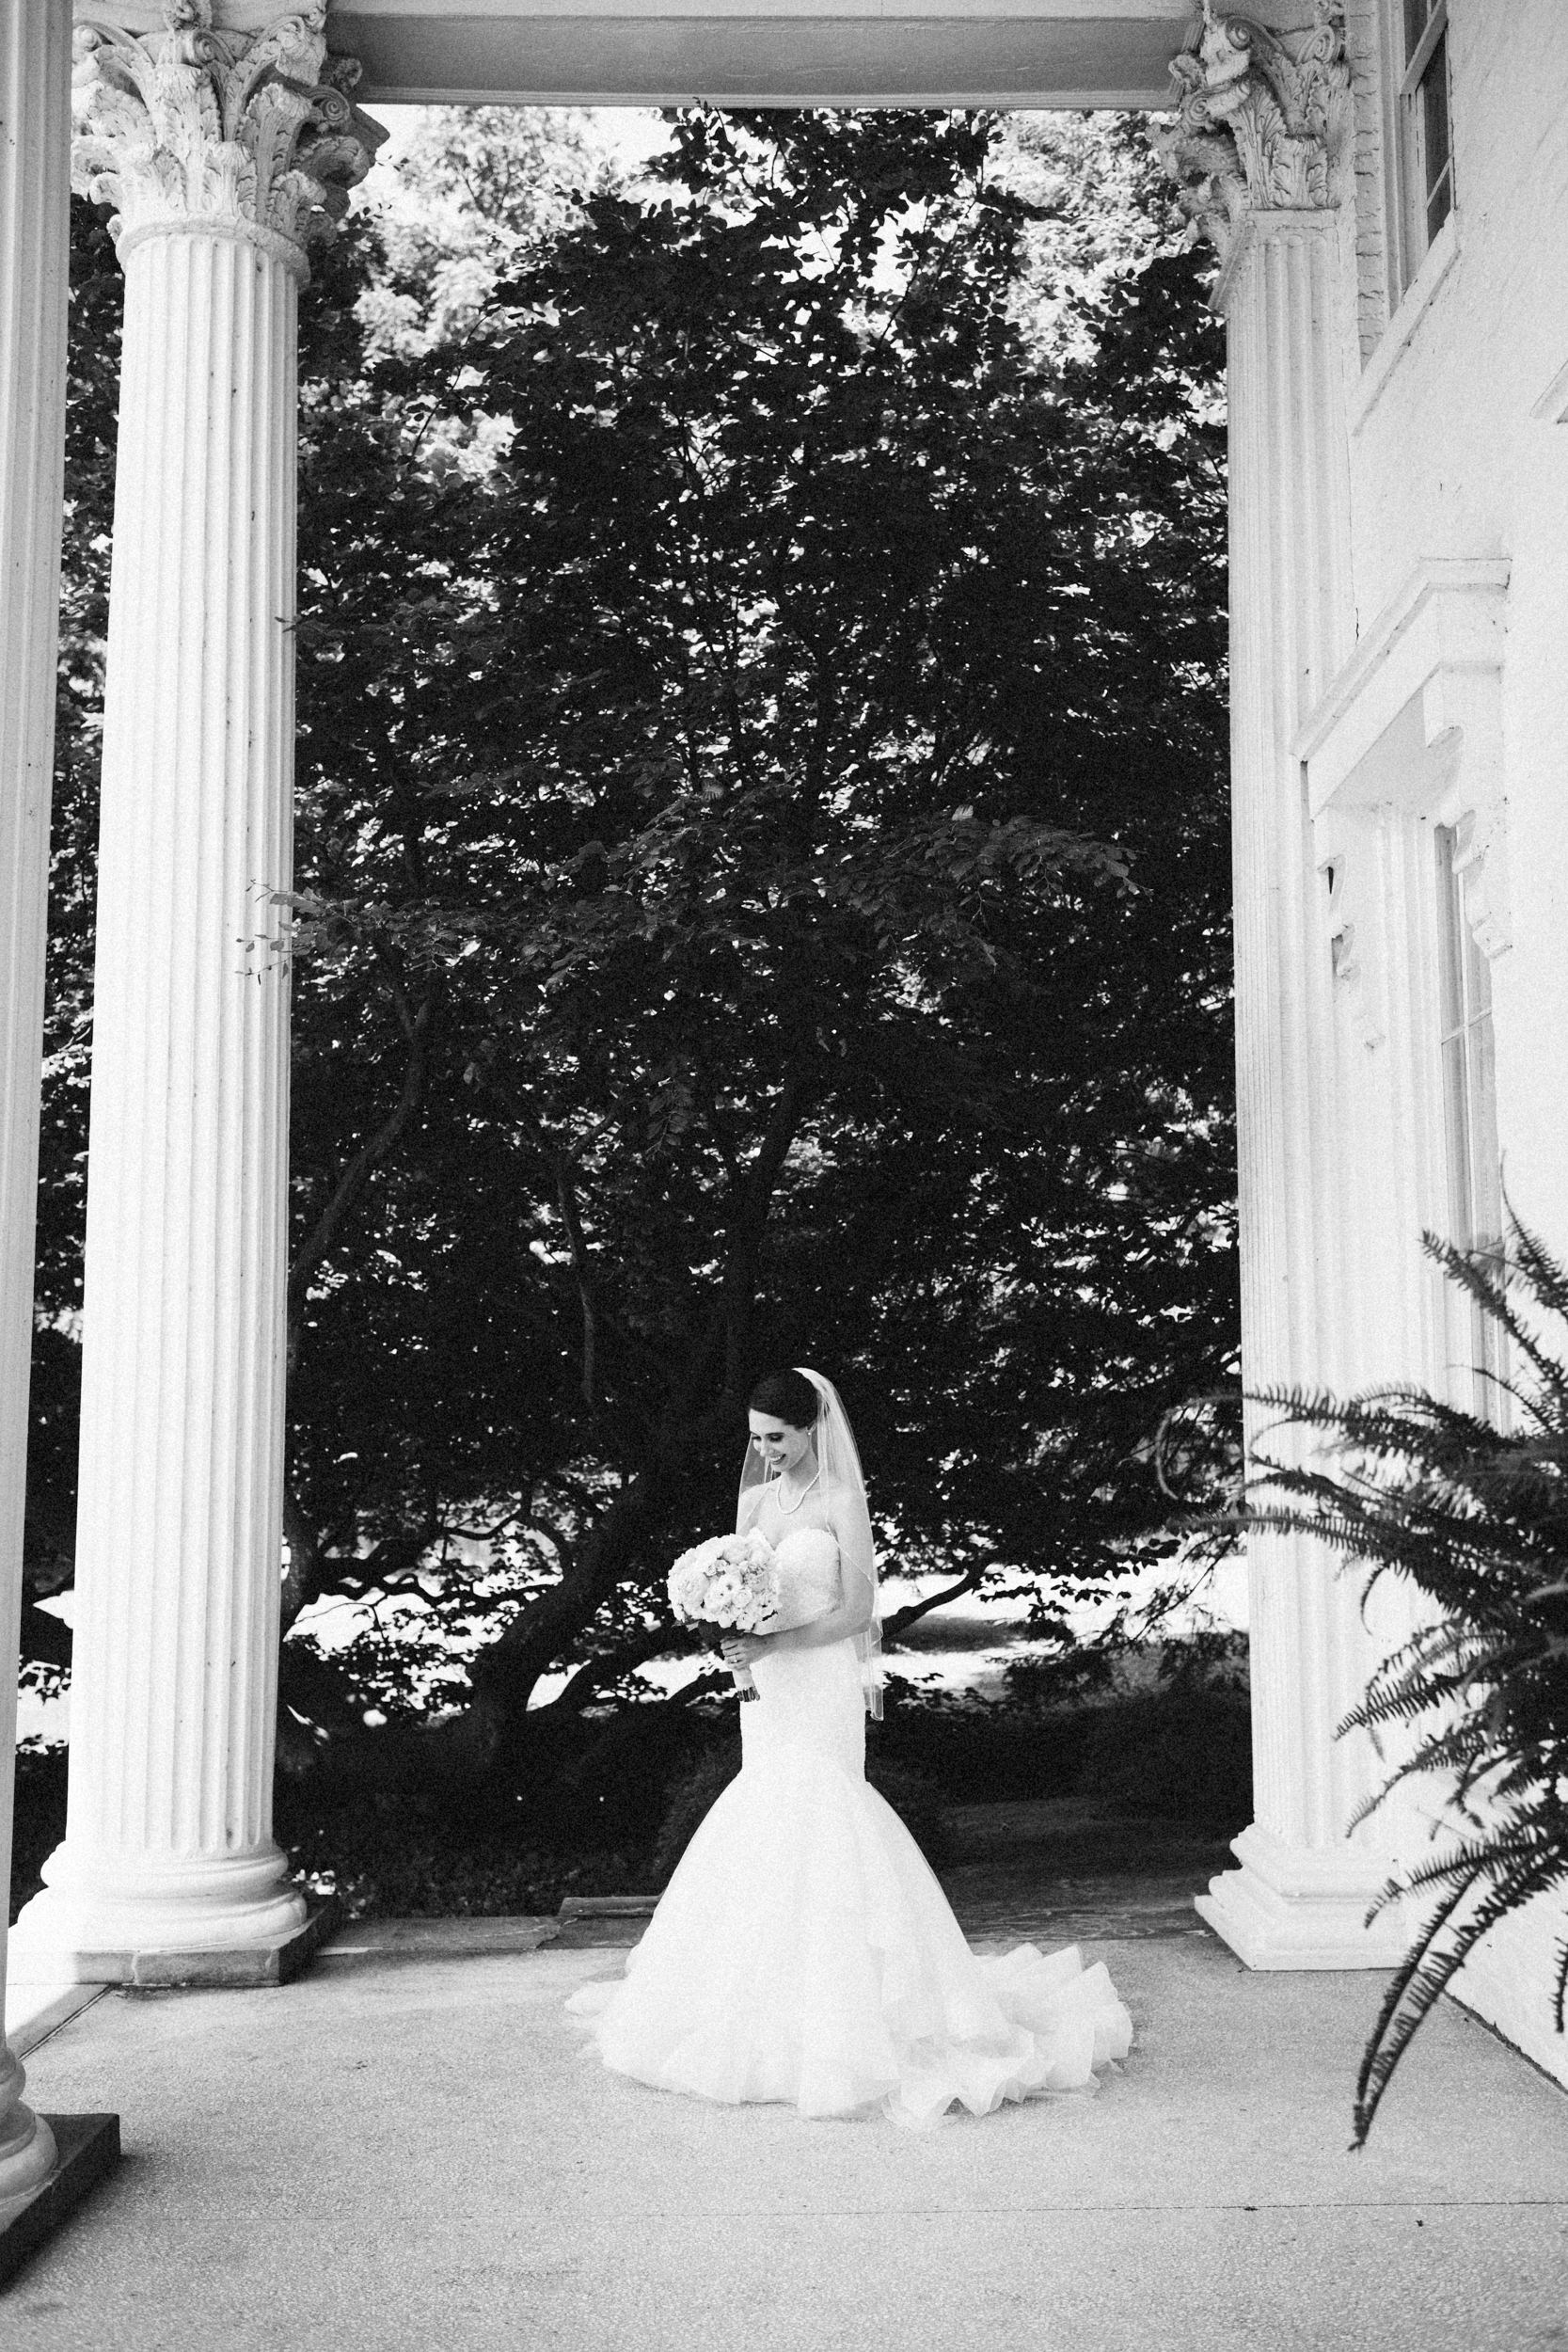 Louisville-Kentucky-Wedding-Elopement-Photographer-Sarah-Katherine-Davis-Photography-Whitehall-Classic-Timeless-Garden-Wedding-230.jpg